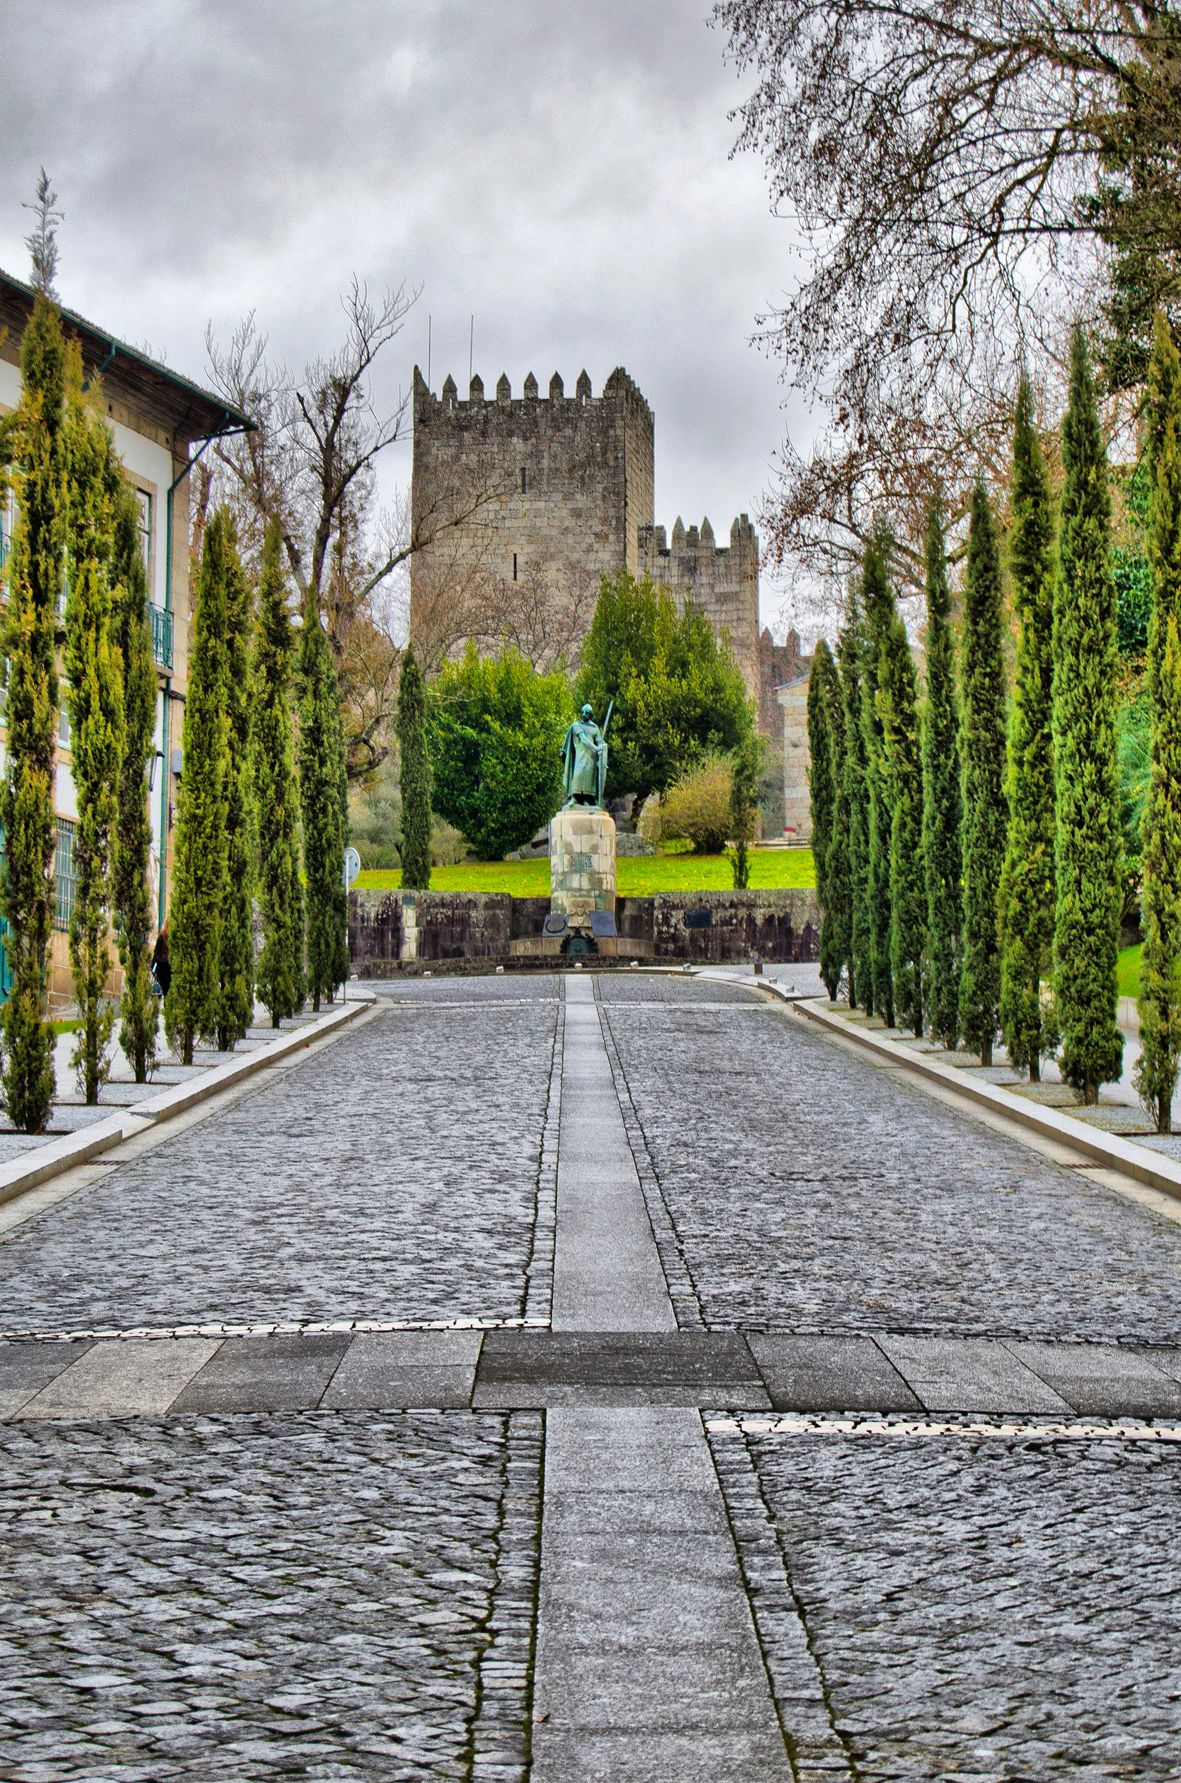 Guimarães Castle, Guimarães - Portugal. Image by Paulo Vale